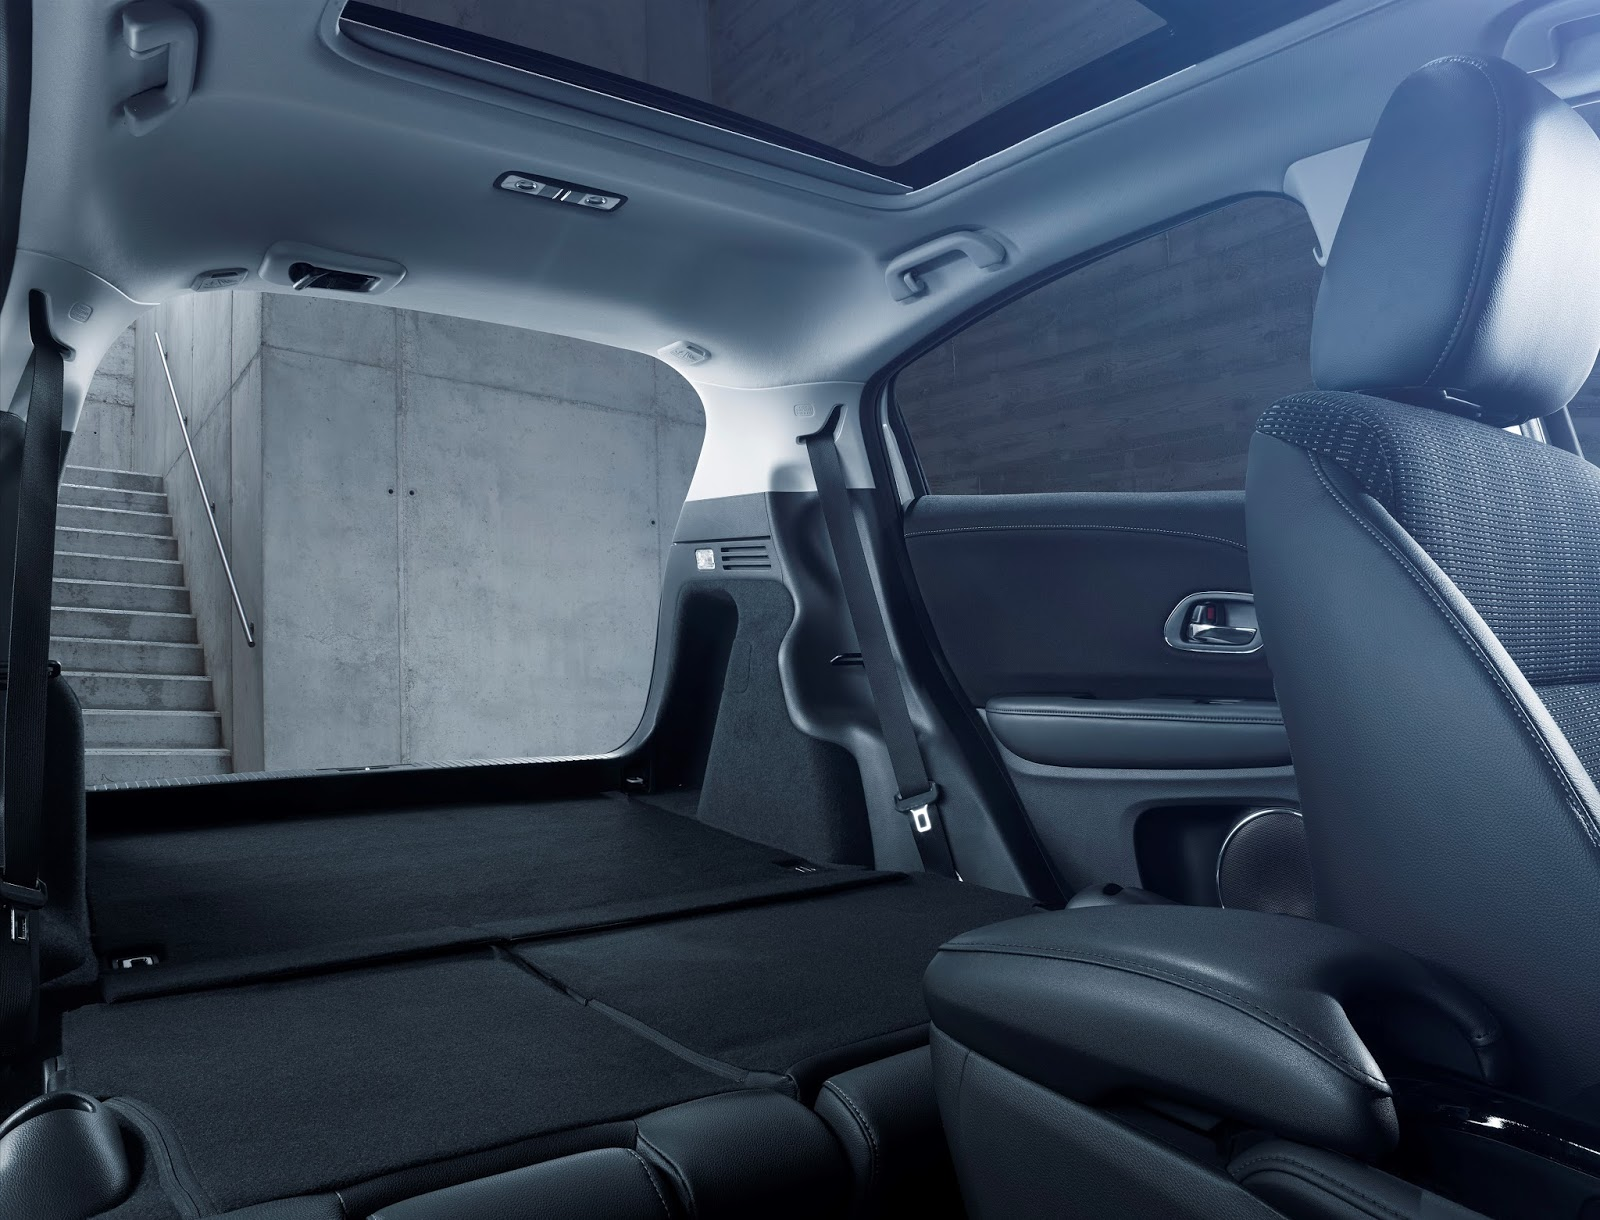 40678 2015 Honda HR V Νέο Honda HR-V : Το πολυμορφικό SUV